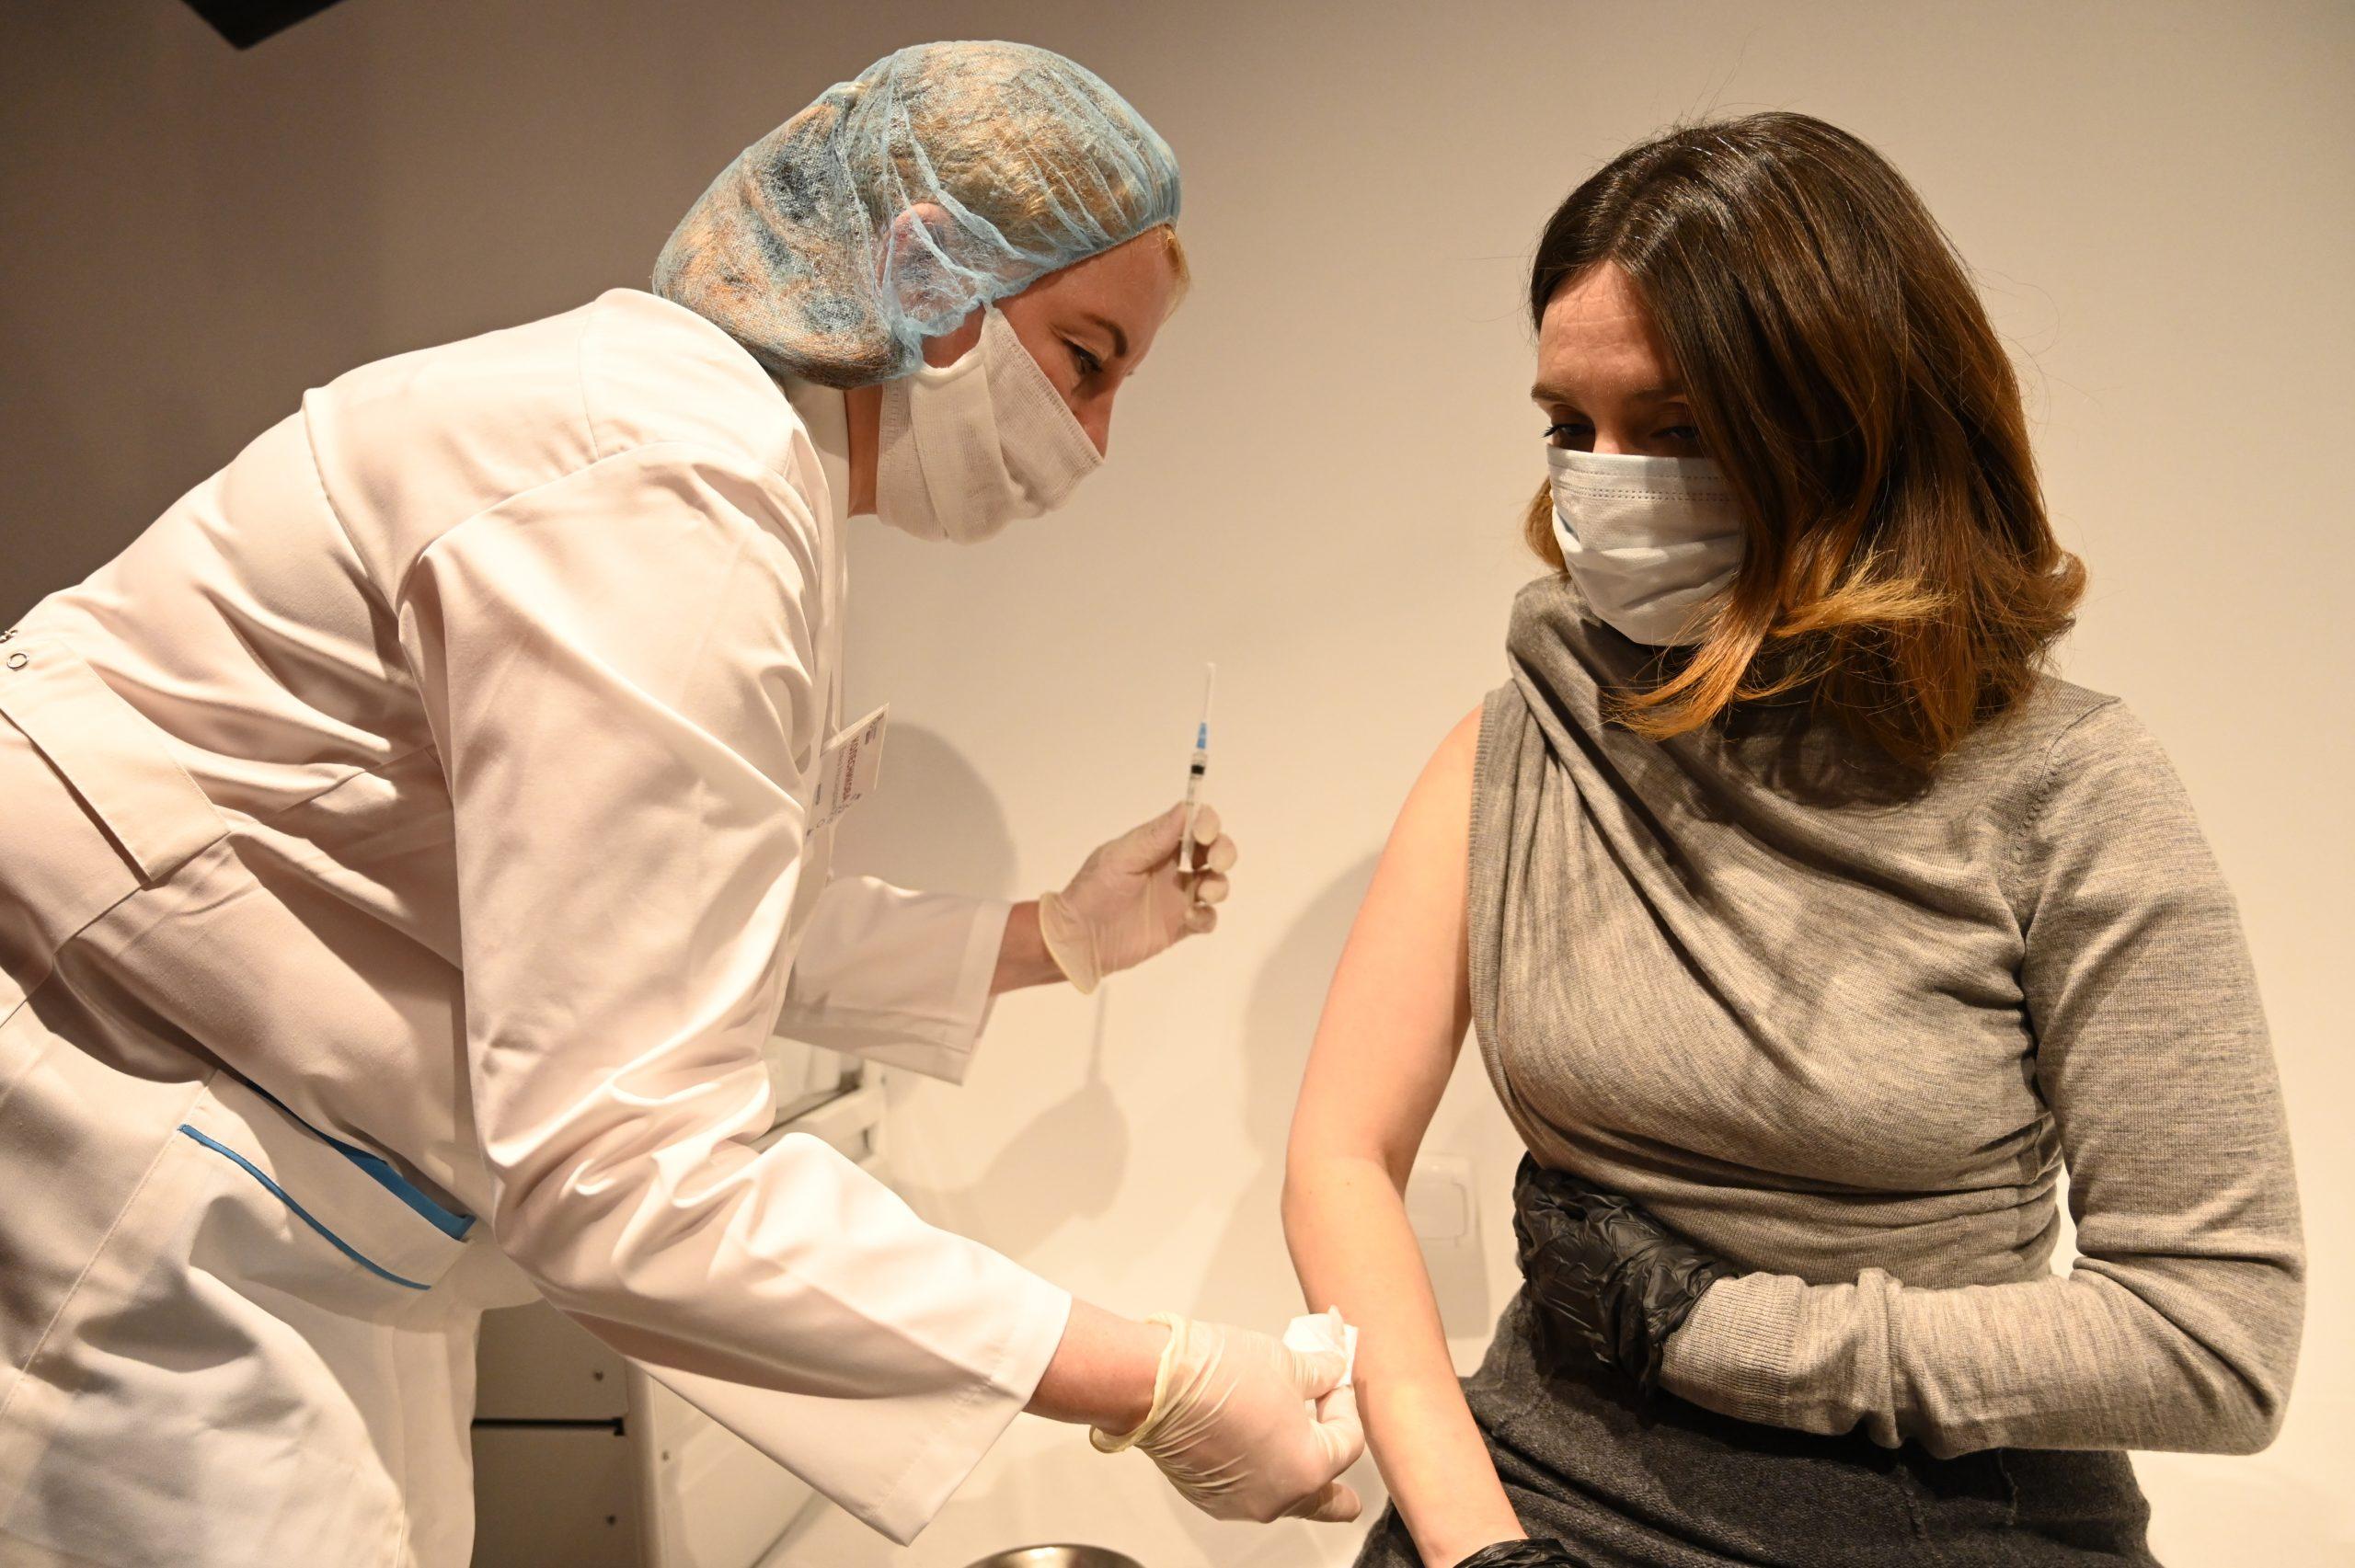 Московские врачи поставили более 1,7 тысячи диагнозов COVID-19 за сутки